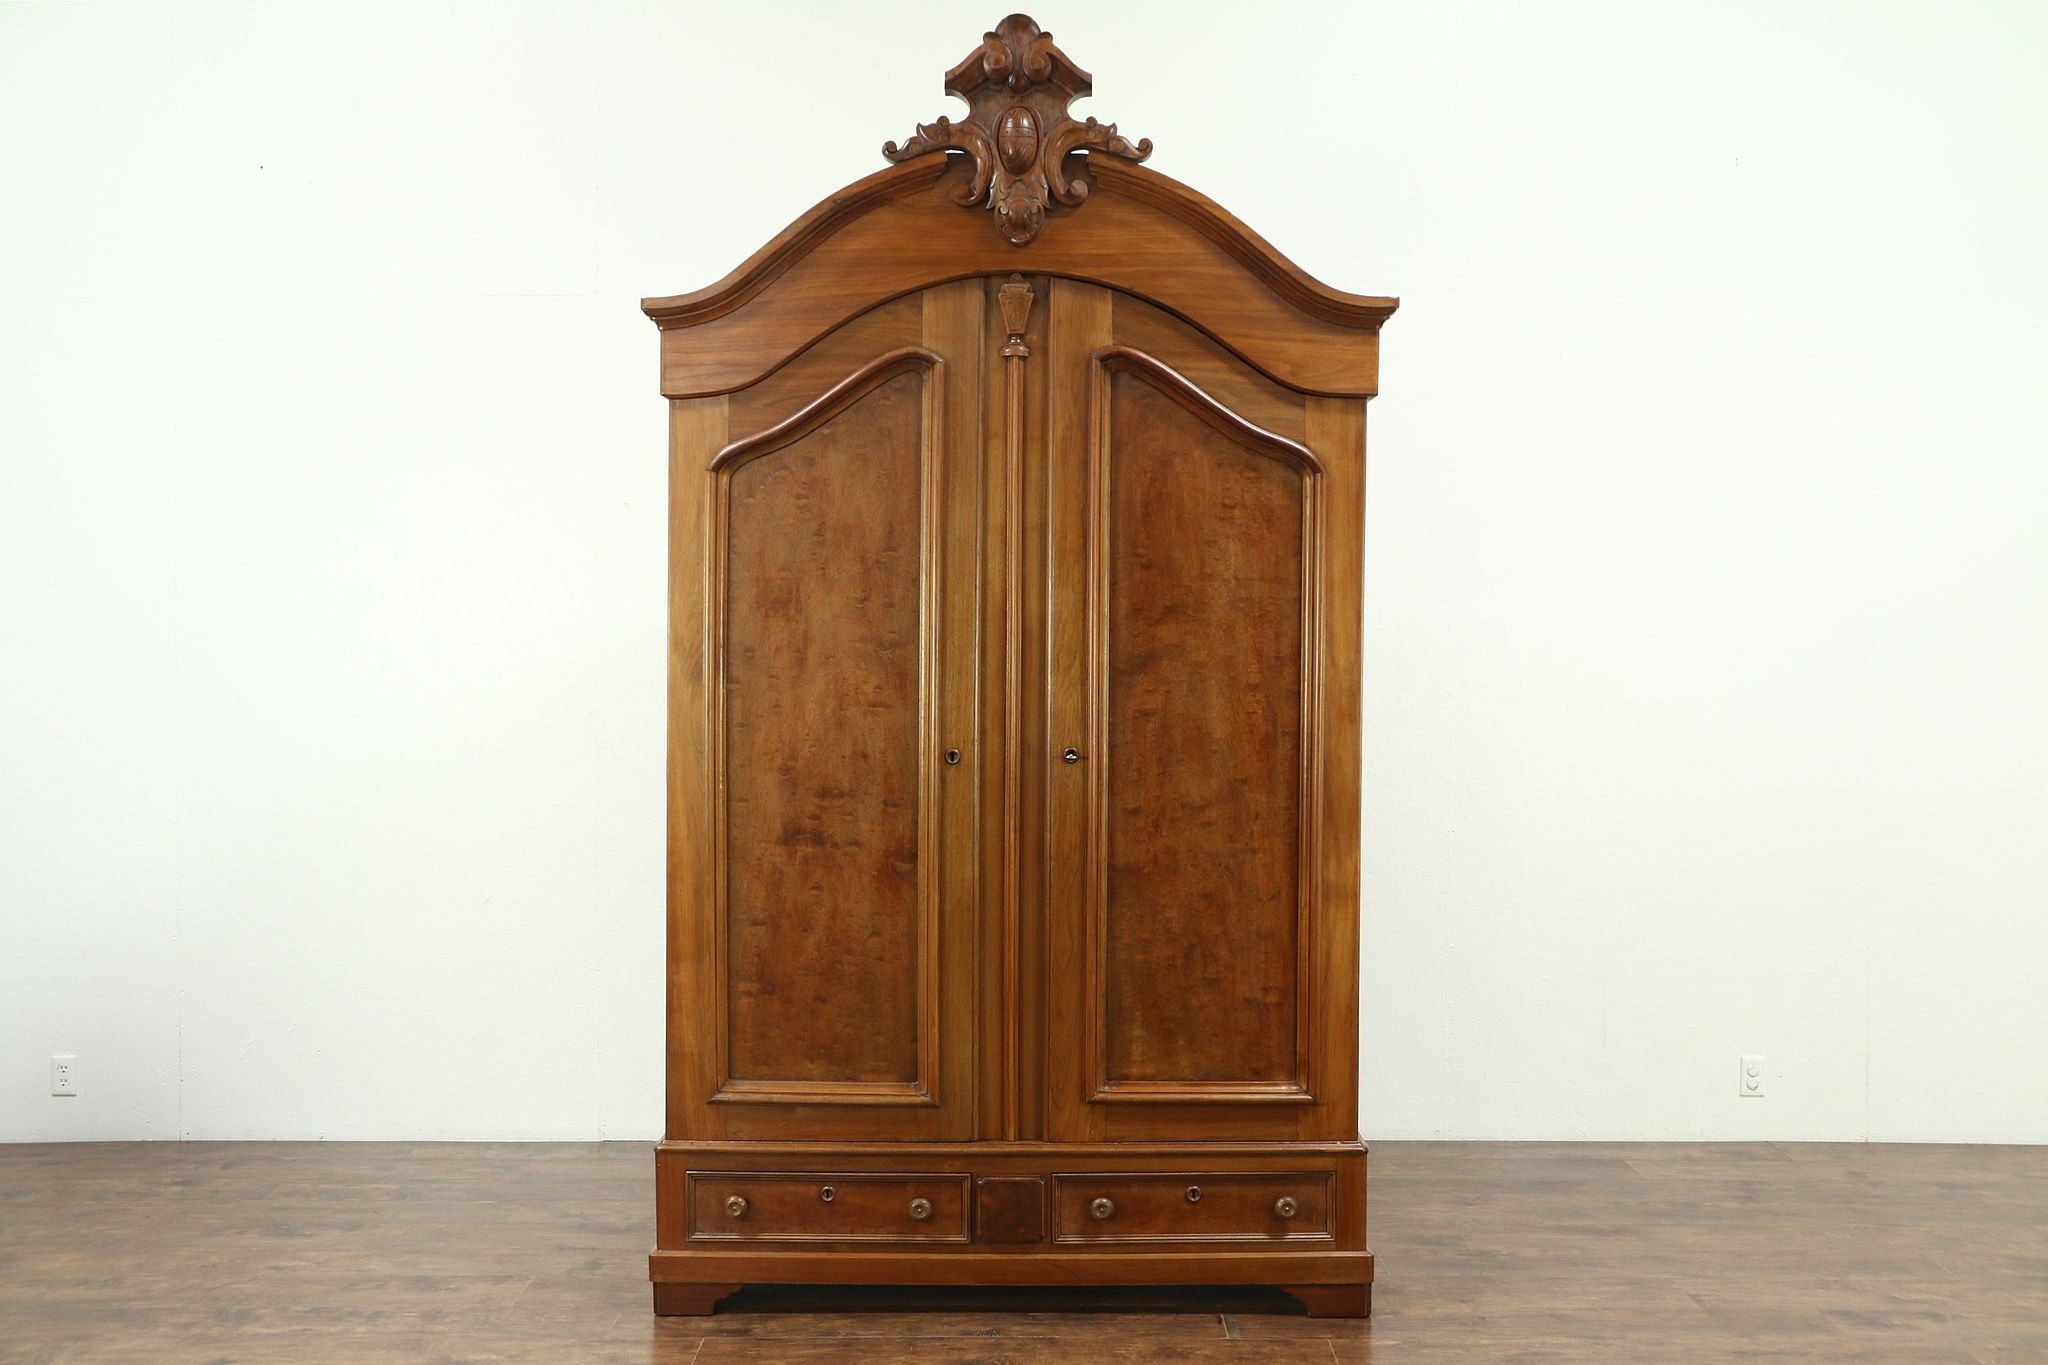 Ordinaire Victorian Antique 1860 Walnut Armoire, Closet Or Wardrobe #28644